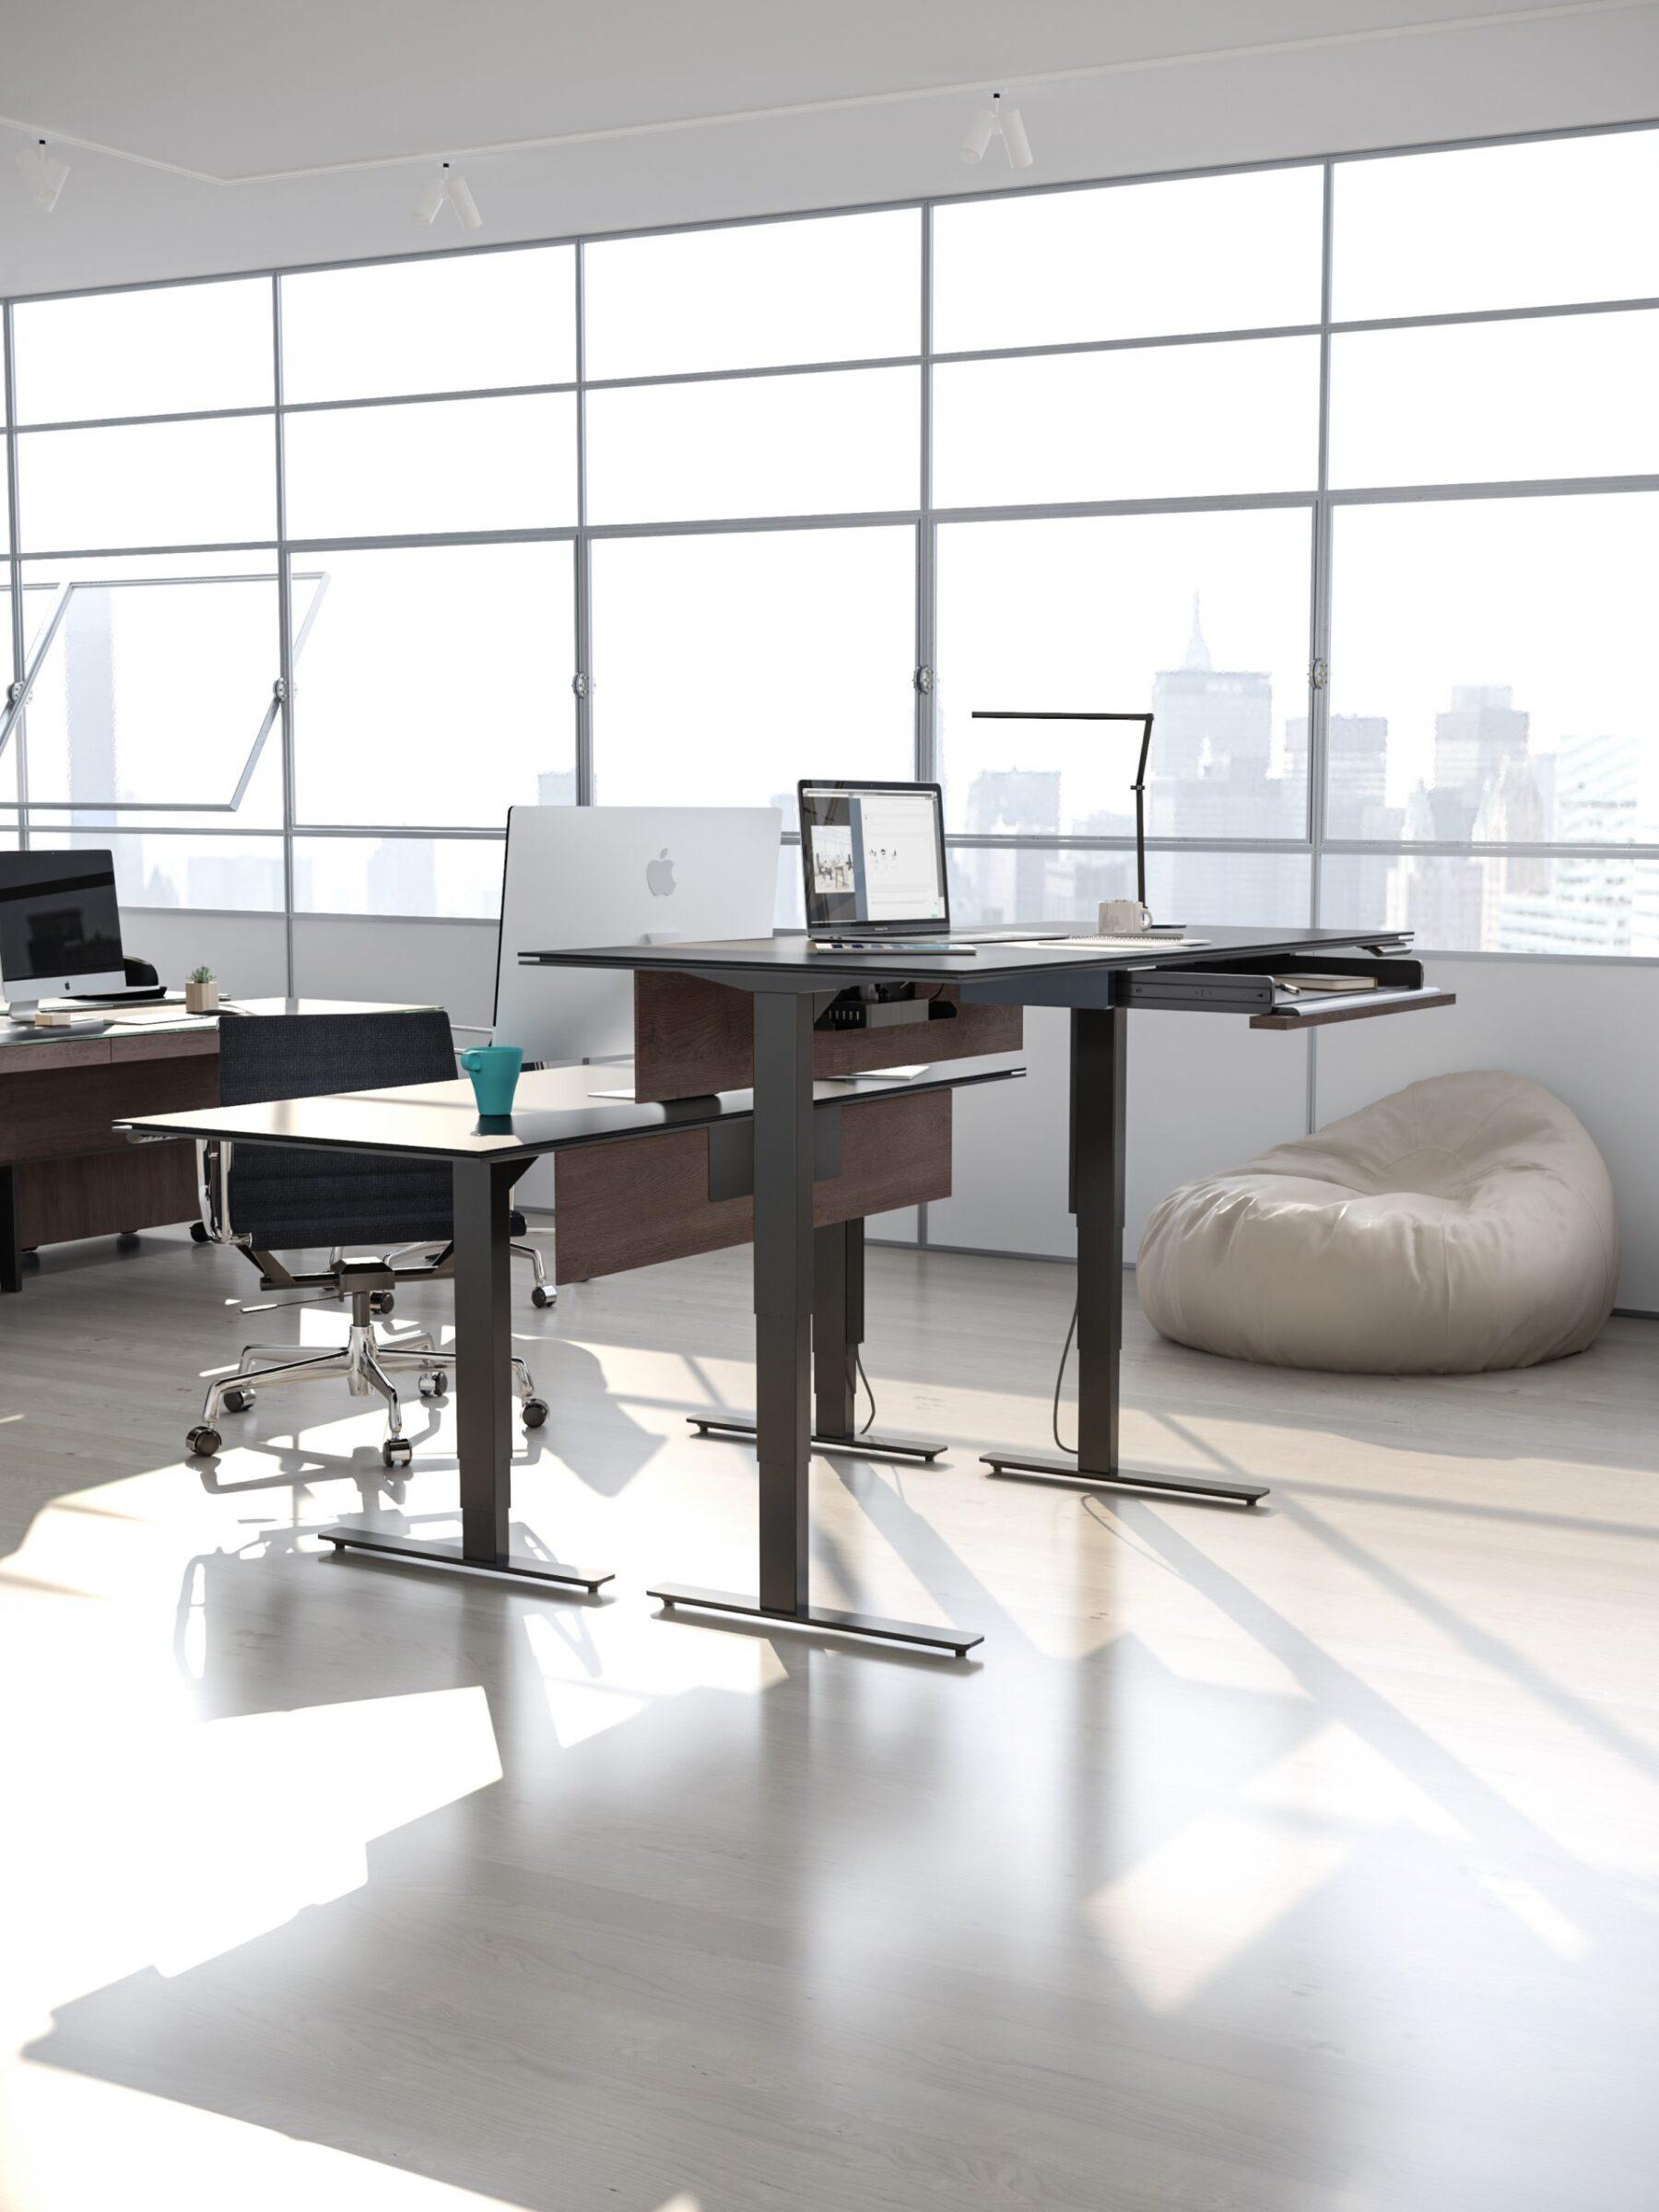 stance-lift-desk-6650-BLK-BDI-height-adjustable-desk-LS3A